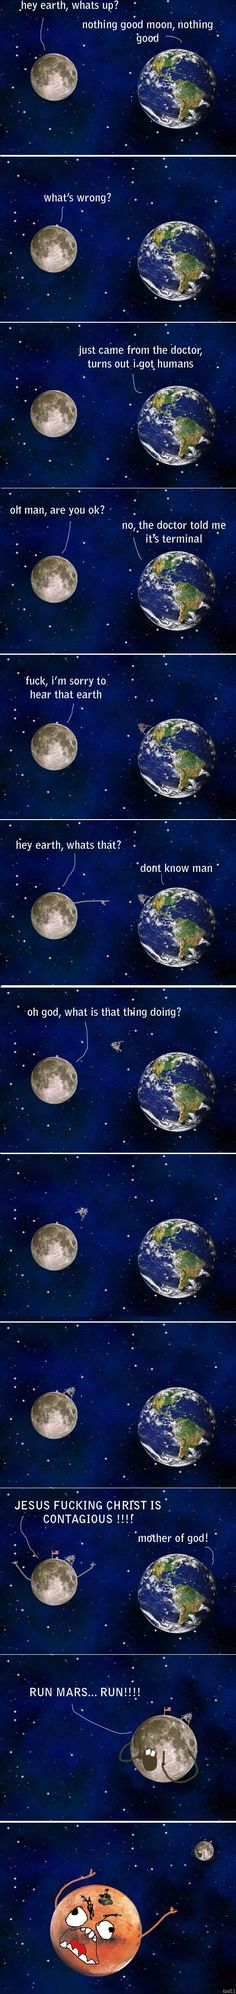 Earth's disease